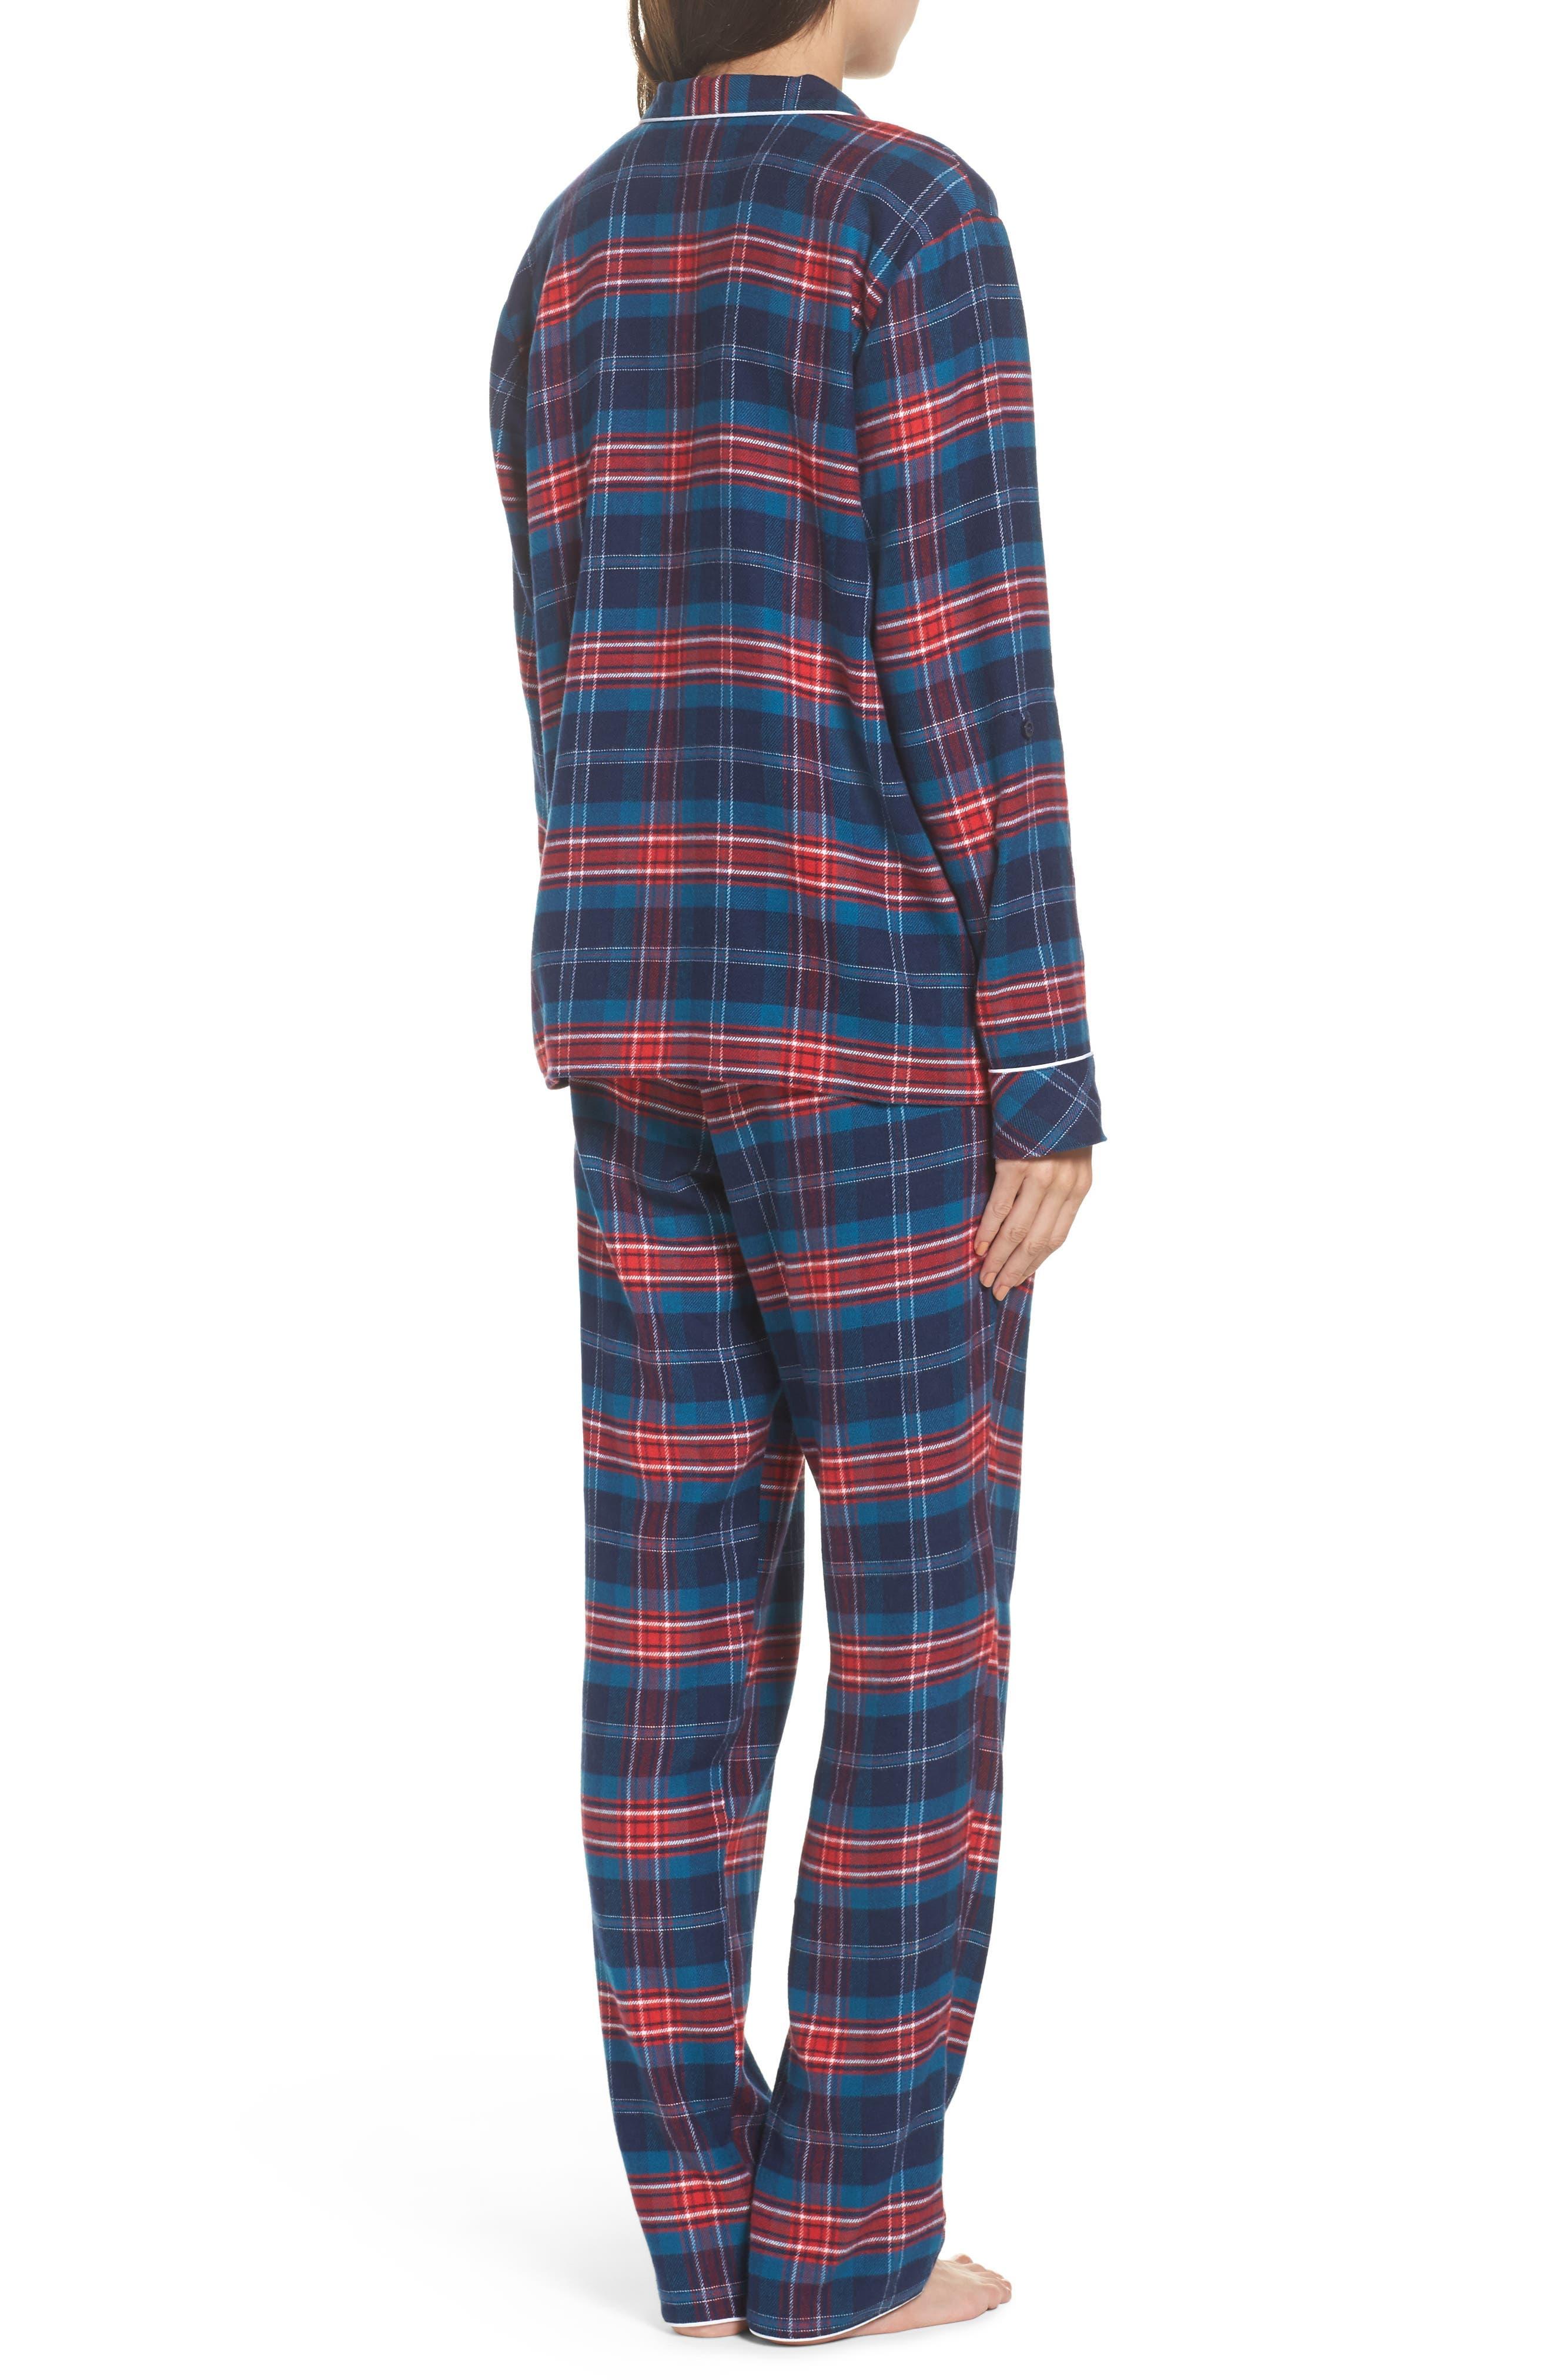 Lingerie Starlight Flannel Pajamas,                             Alternate thumbnail 7, color,